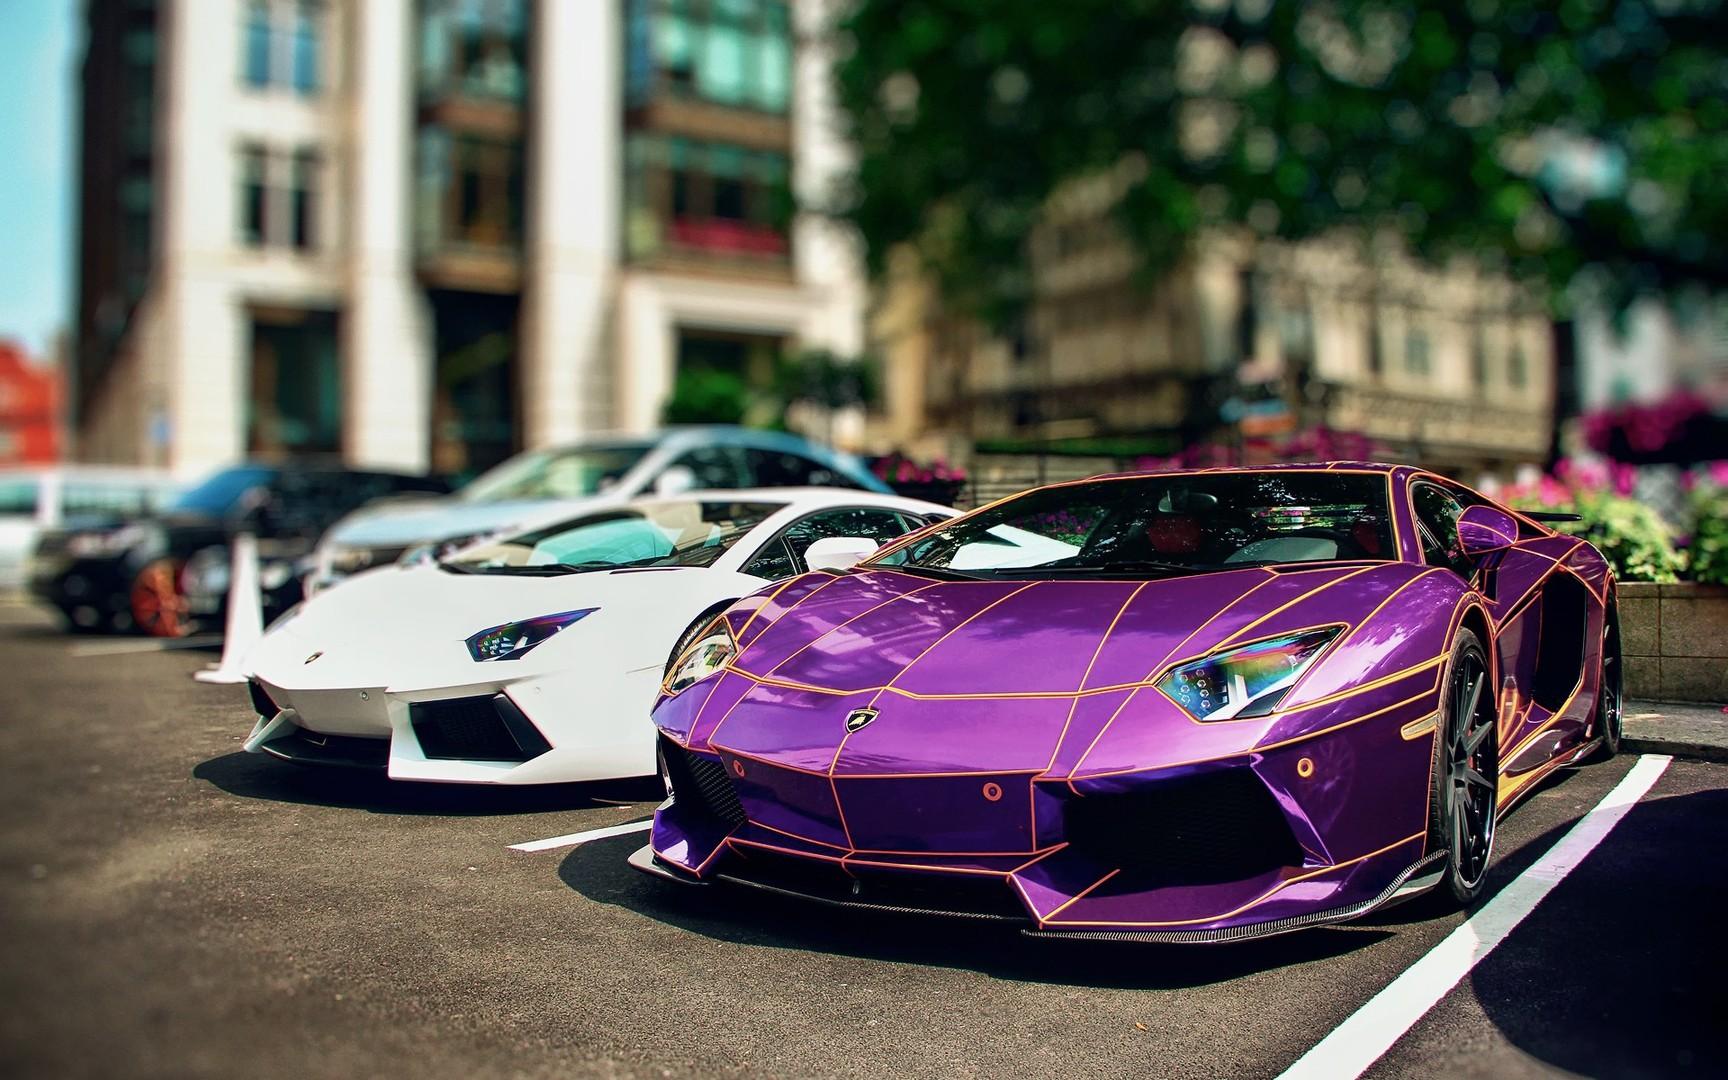 tron lamborghini aventador wallpaper cars wallpaper lamborghini - Tron Lamborghini Aventador Wallpaper